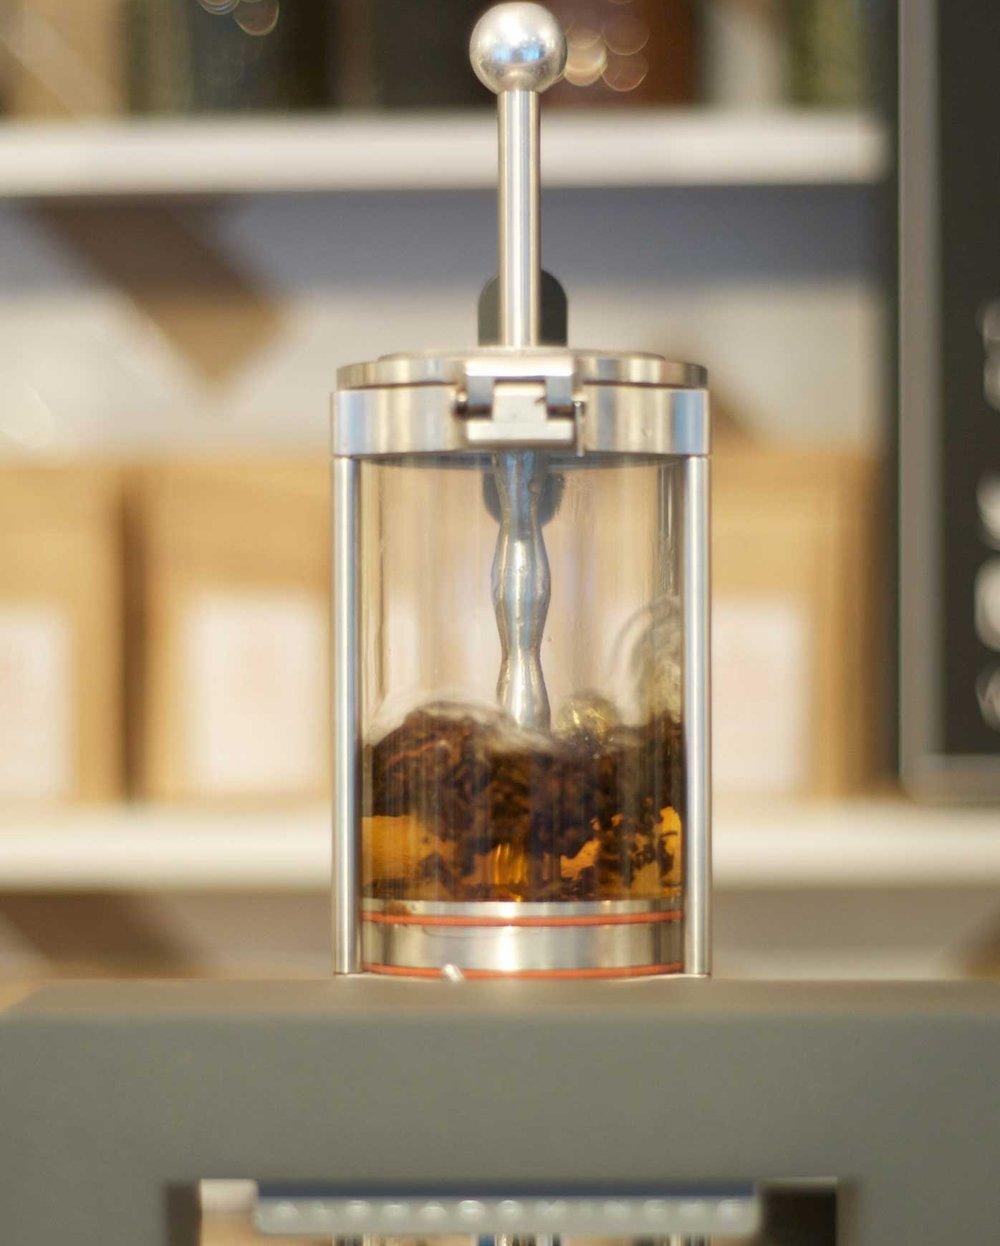 Brewing Oolong Tea